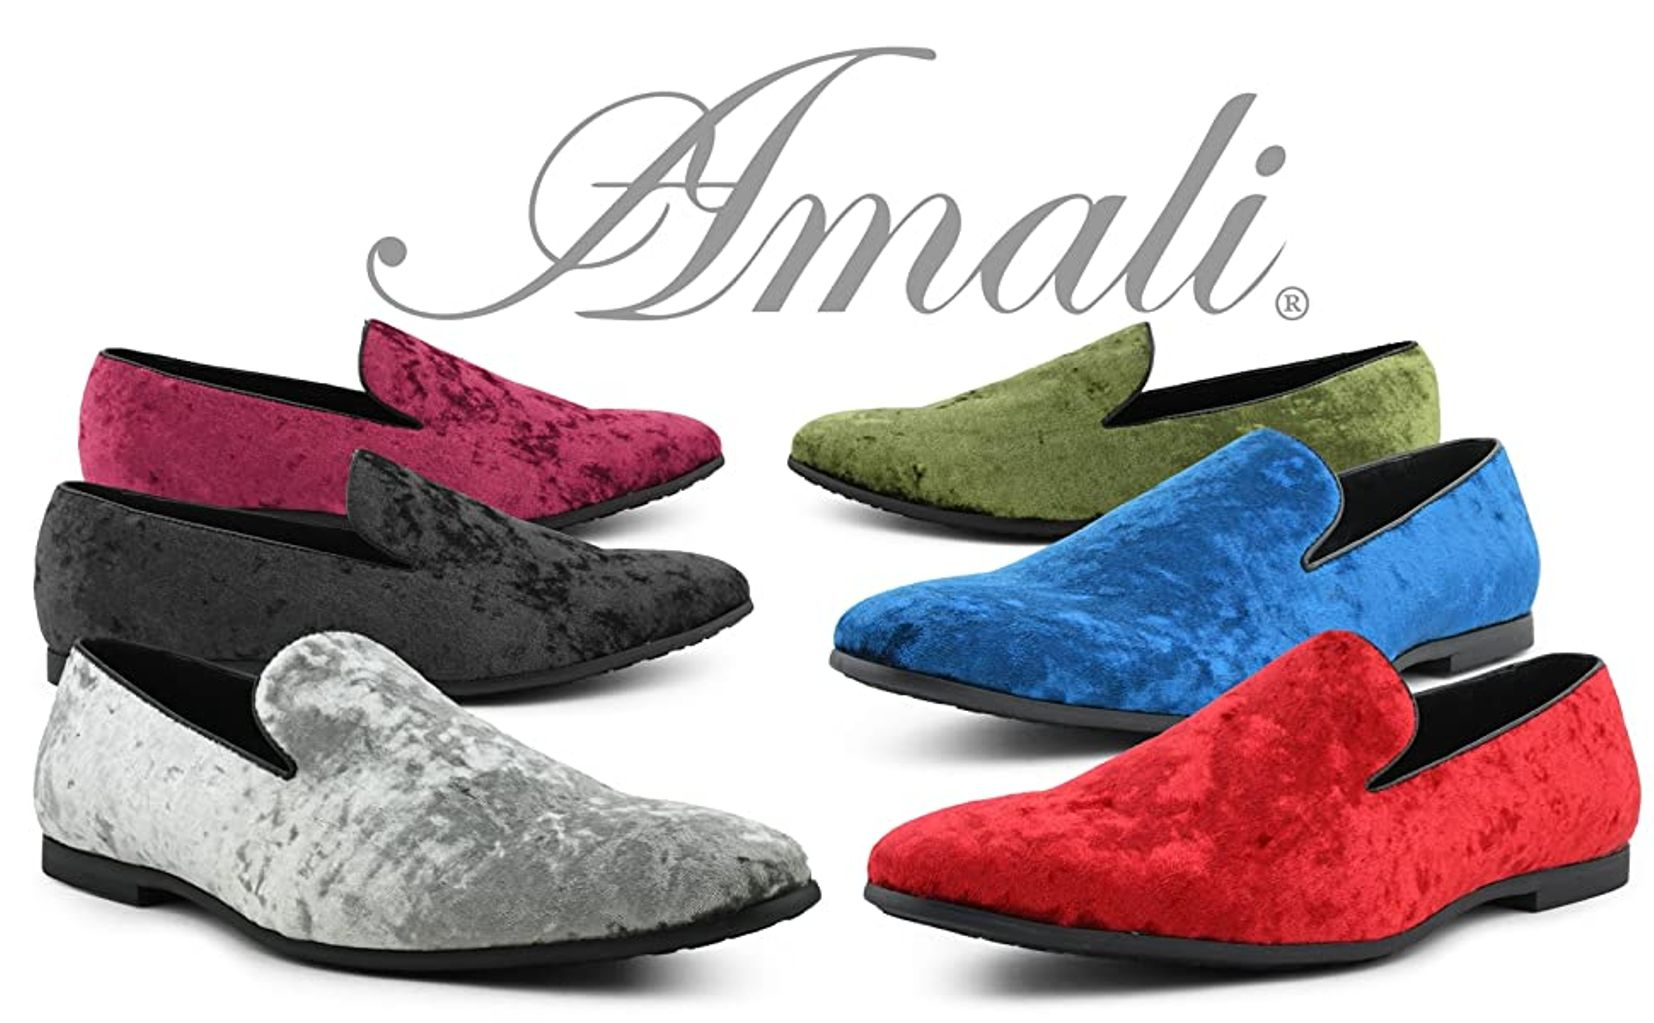 Amali Velvet Tuxedo Shoes Mens Formal Fashion Slip On Loafers 9 Colors Avail.